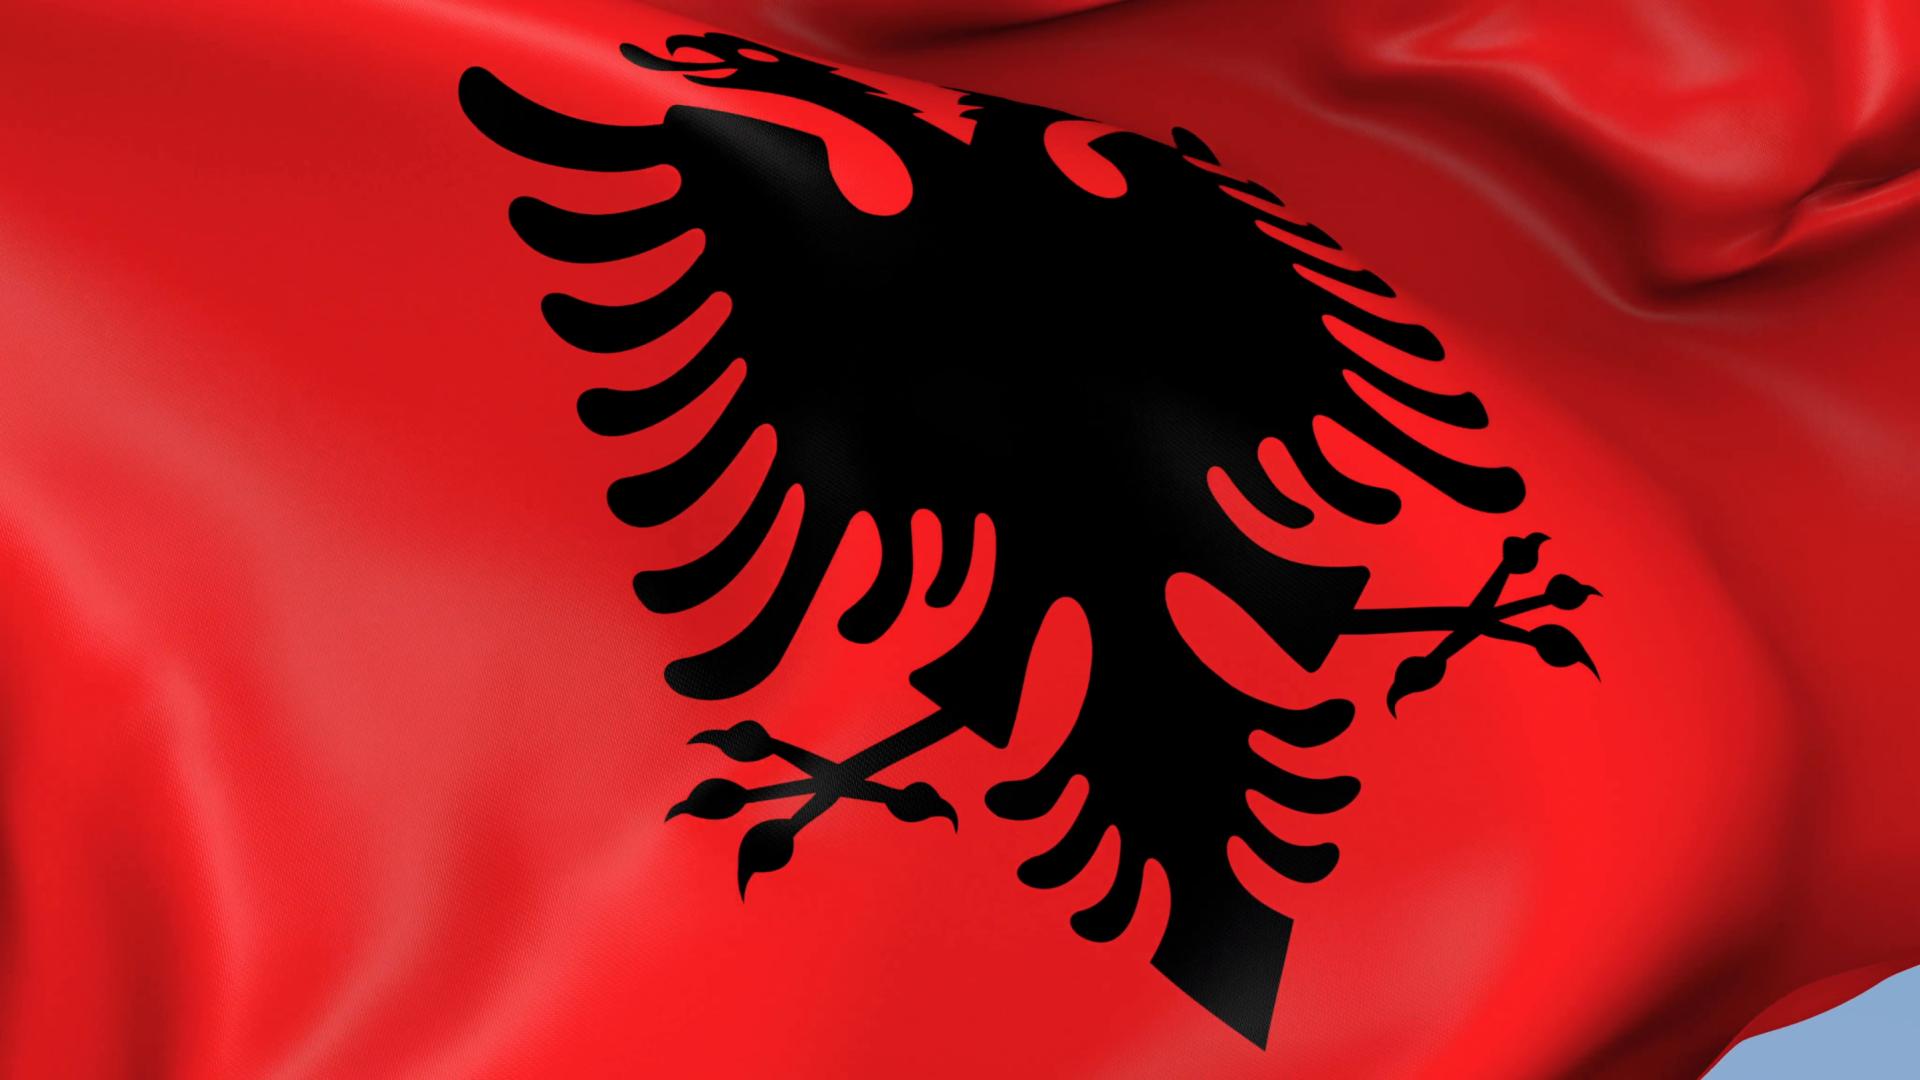 Albania, stat membru NATO, este unul dintre cei mai importanti aliati israelieni in Balcani